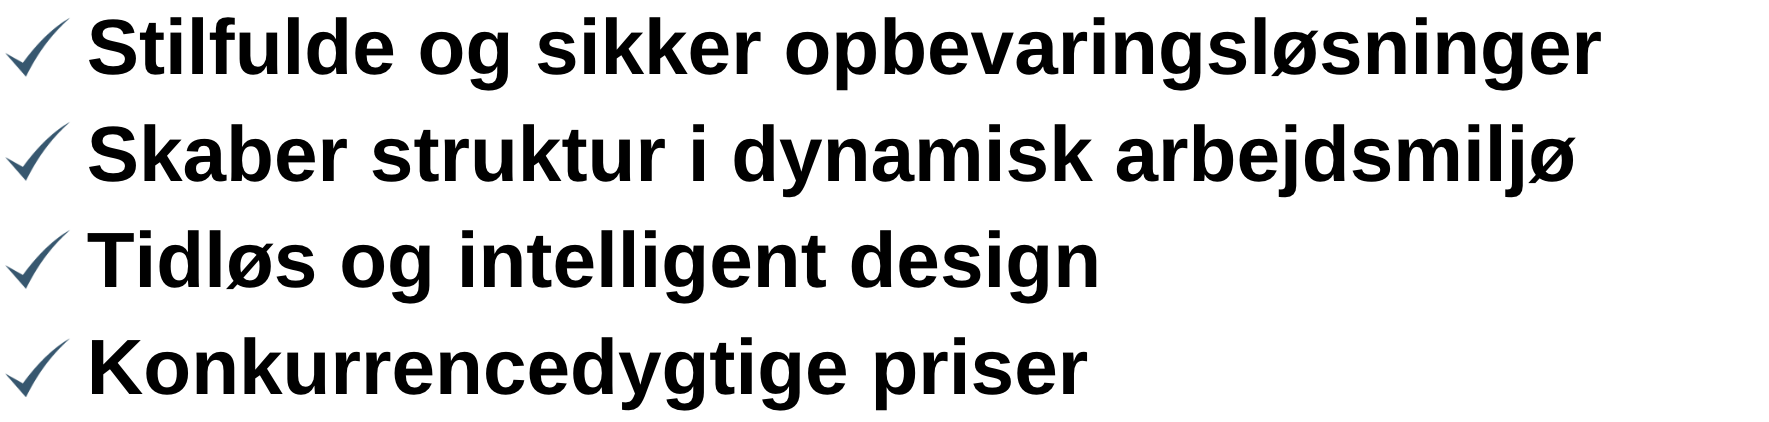 Struktuhr logotekst